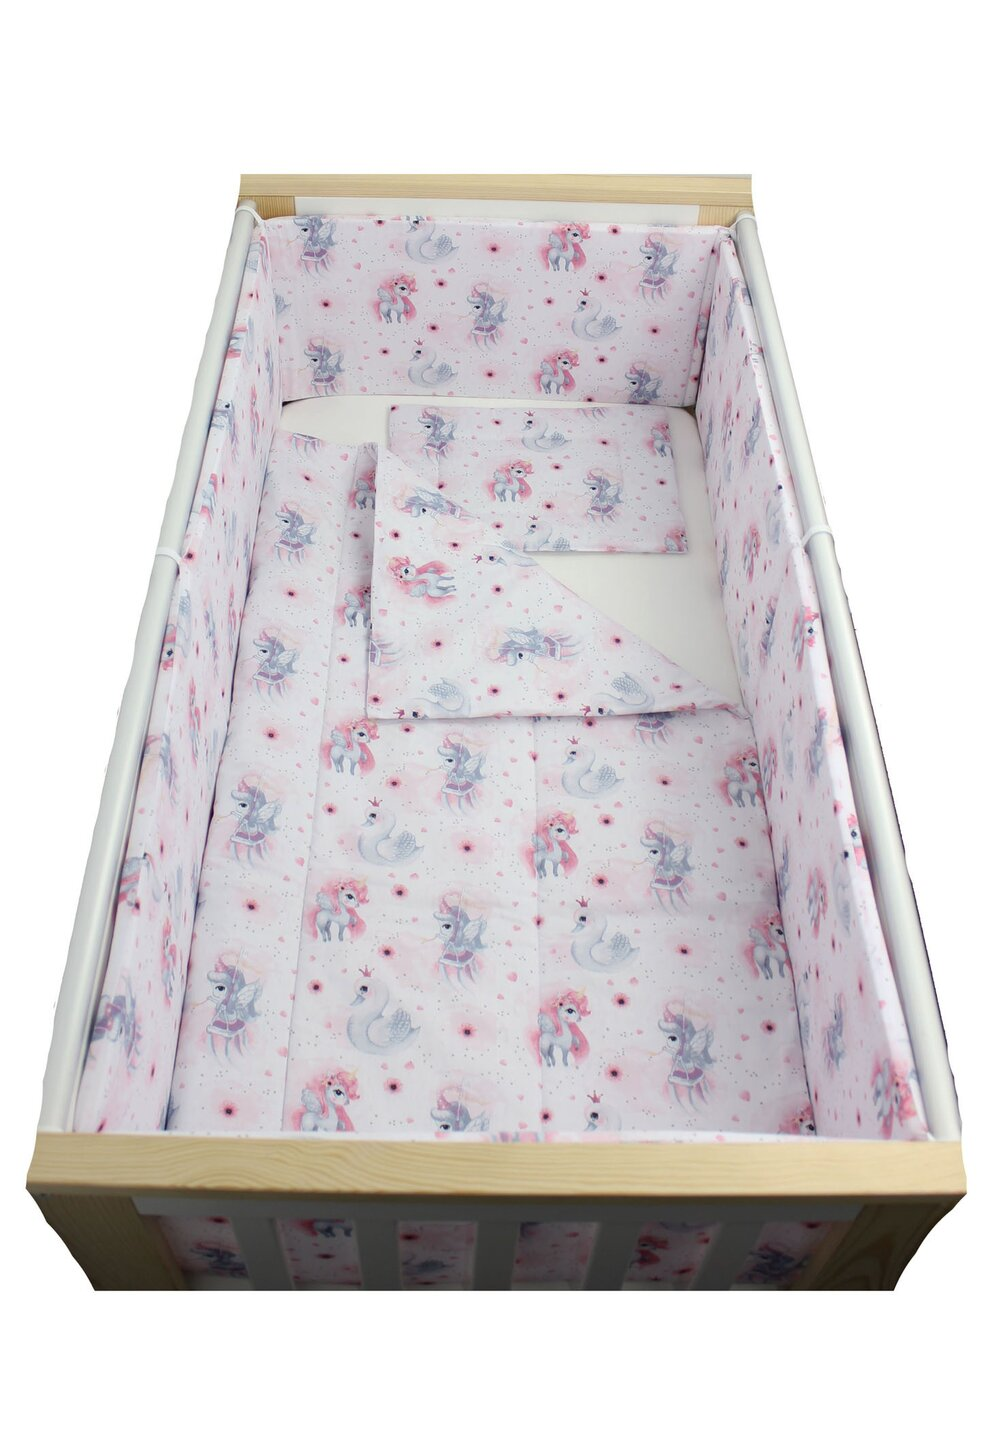 Lenjerie 5 piese, Unicornul roz, 120x60cm imagine